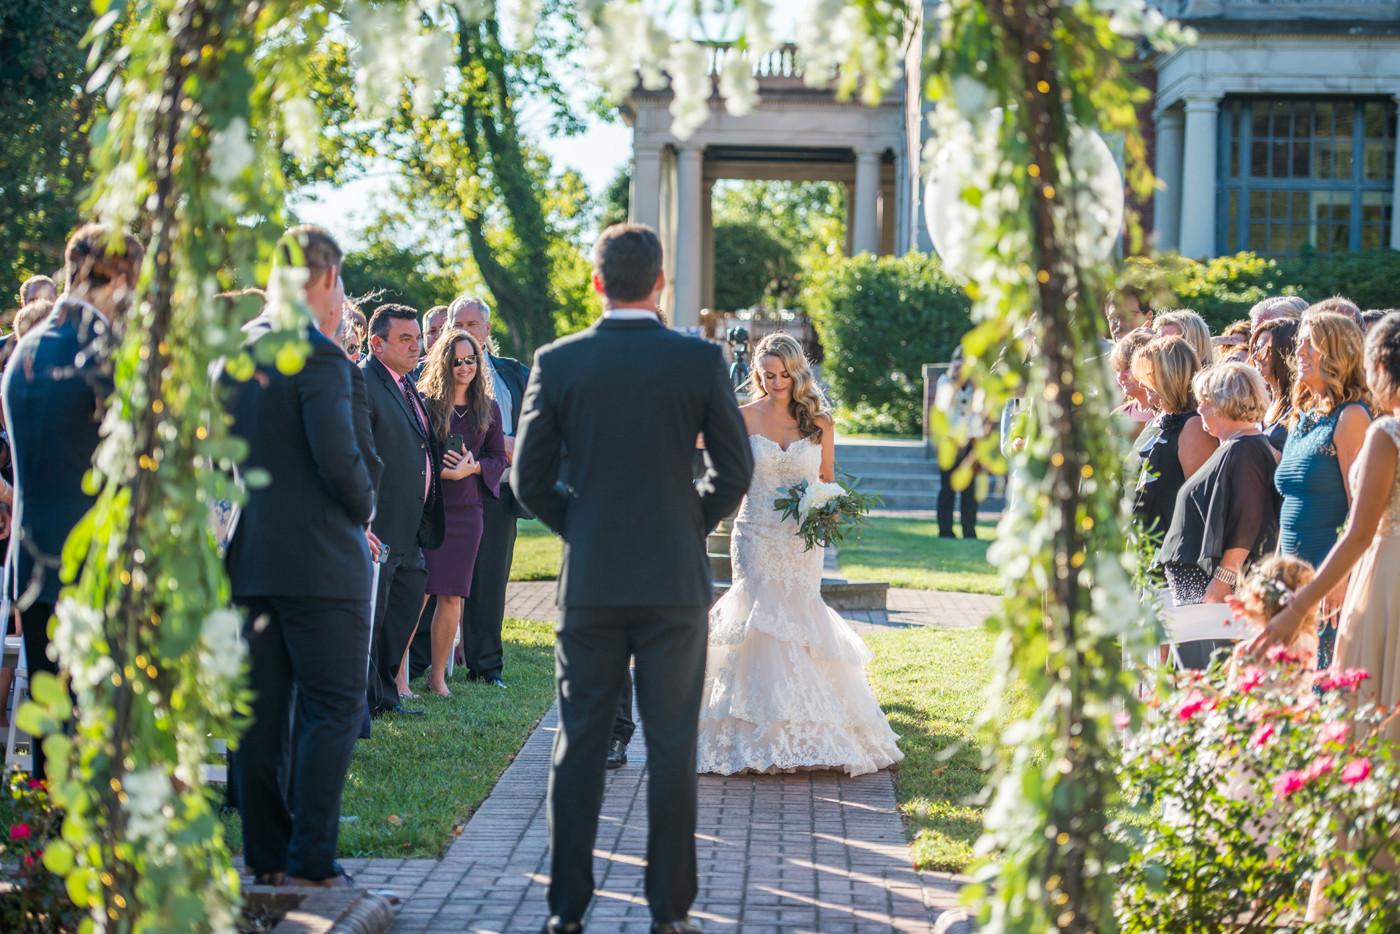 Garden Court Louisville, Kentucky  © Stef Elizabeth Photo - Wedding and Portrait Photographer Serving Louisville, Lexington, Cincinnati and Worldwide